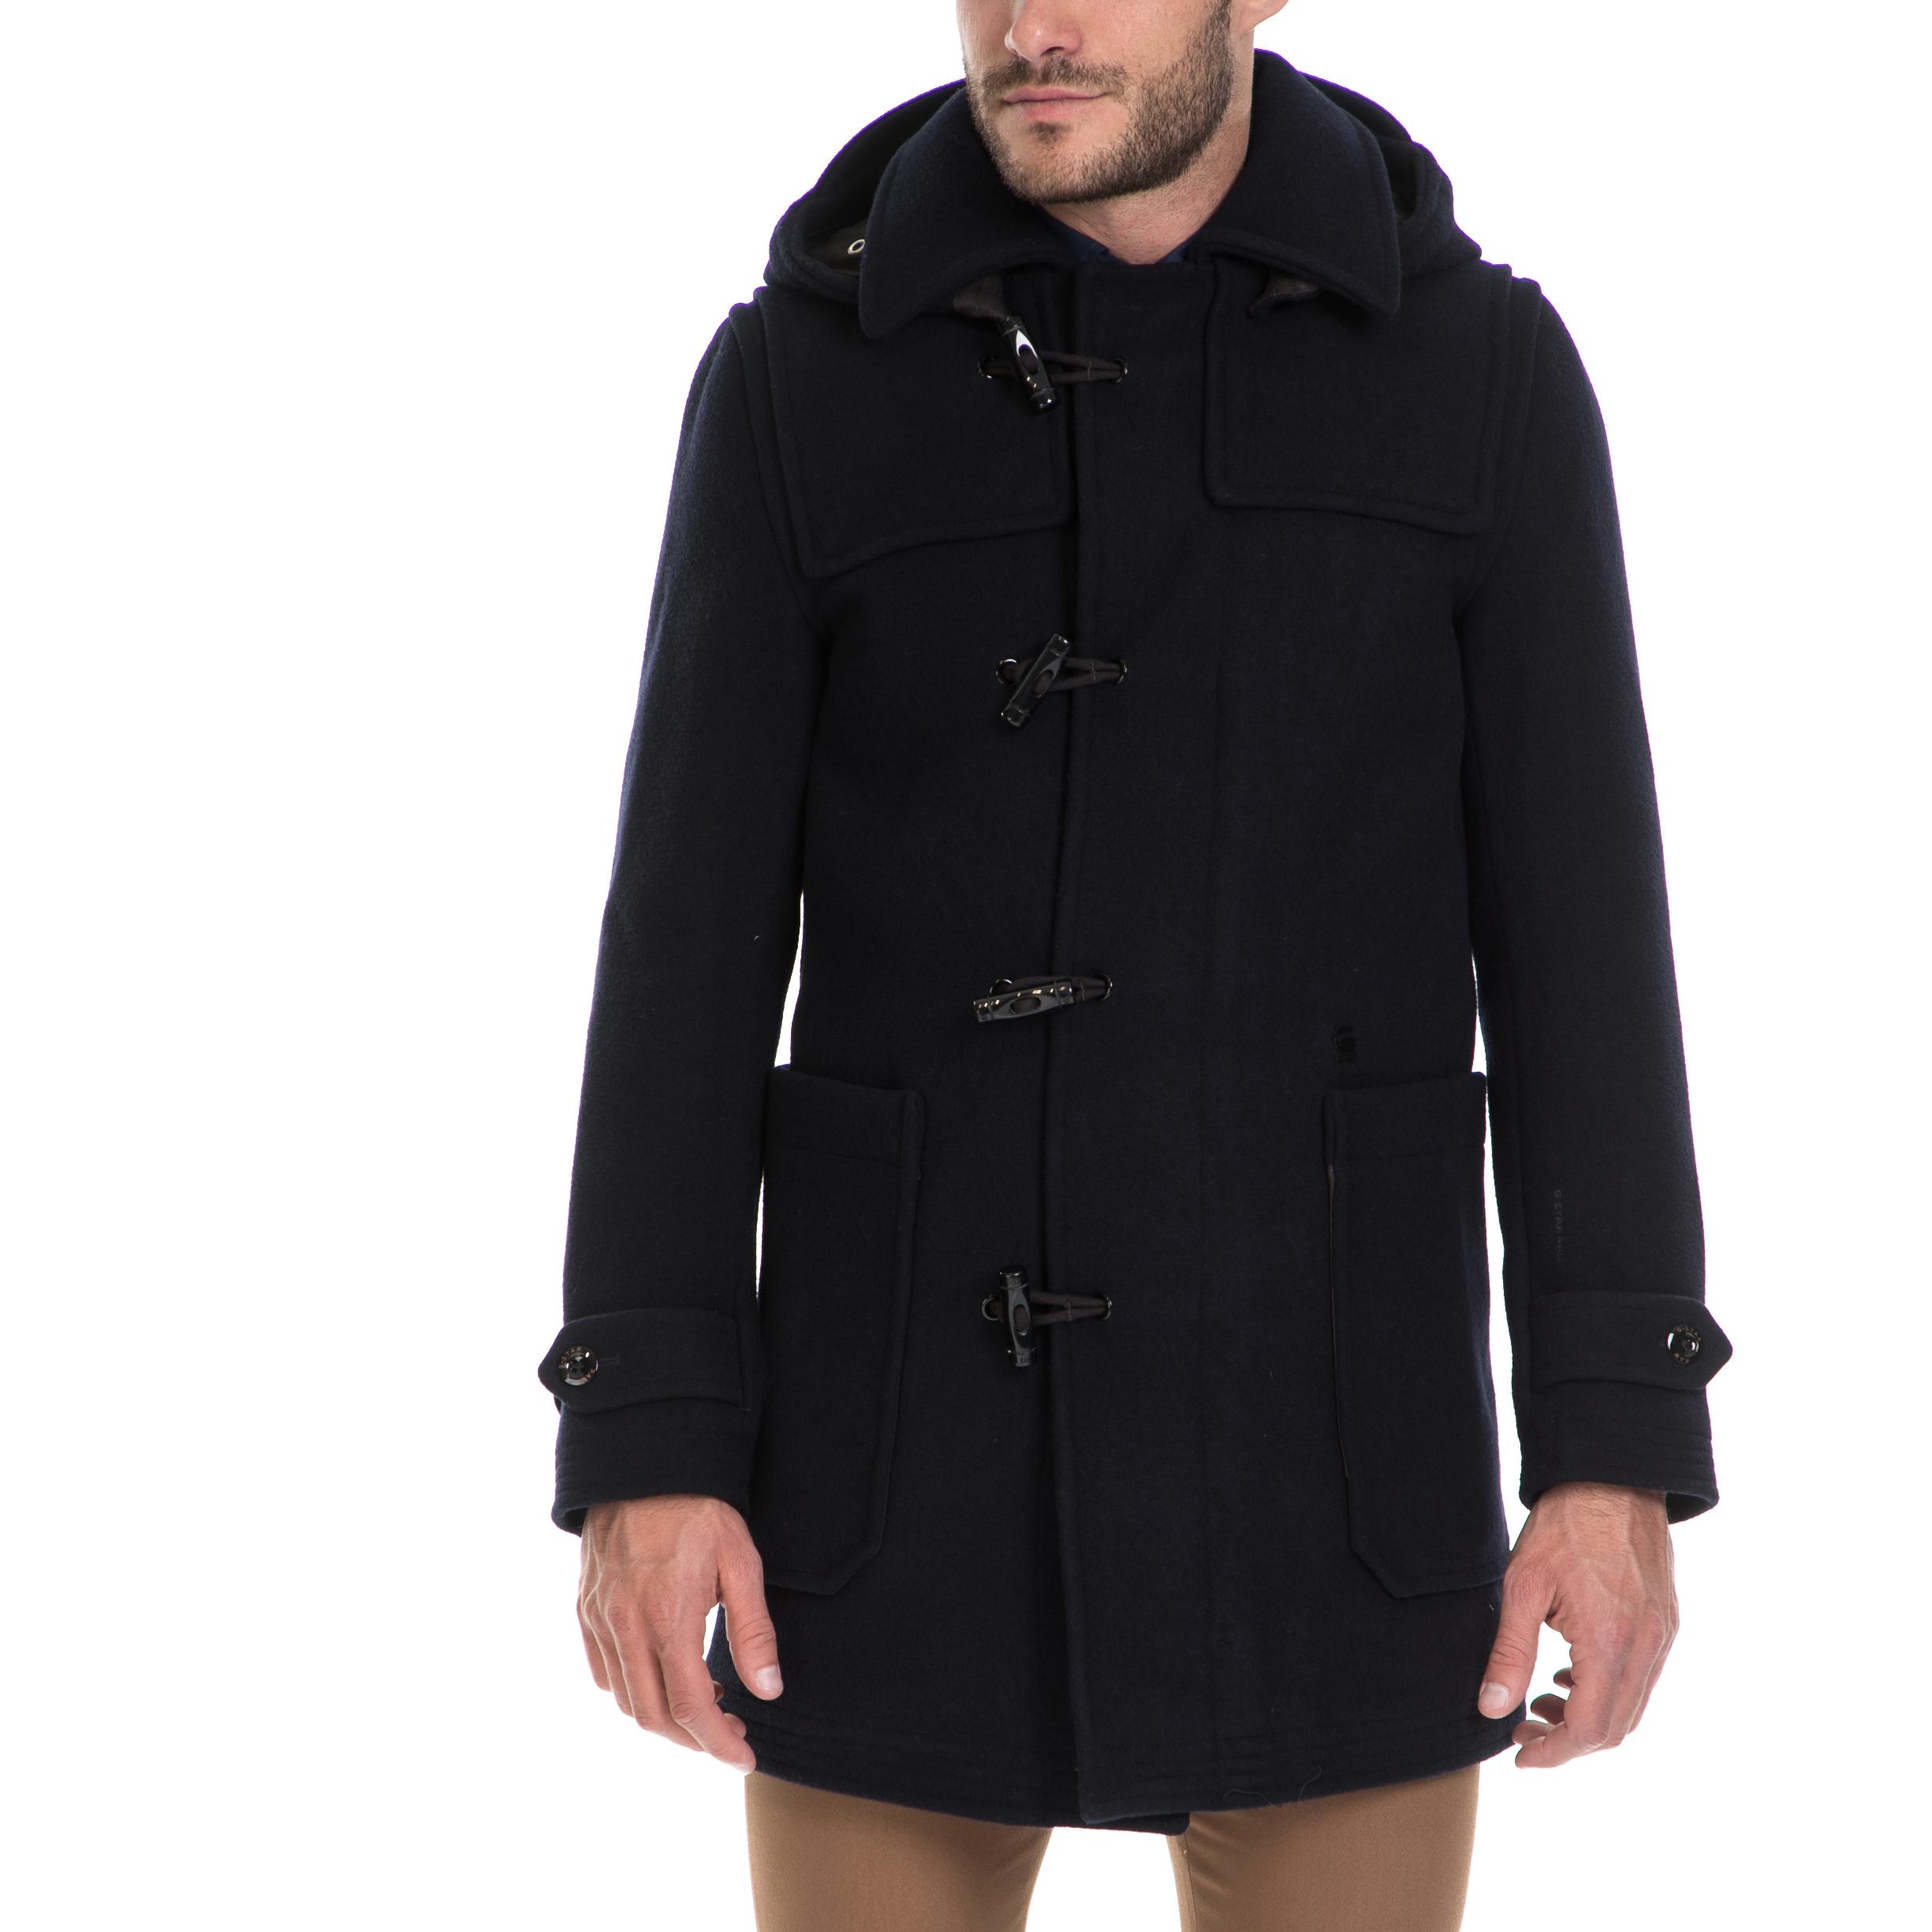 G-STAR – Ανδρικό παλτό G-STAR μαύρο